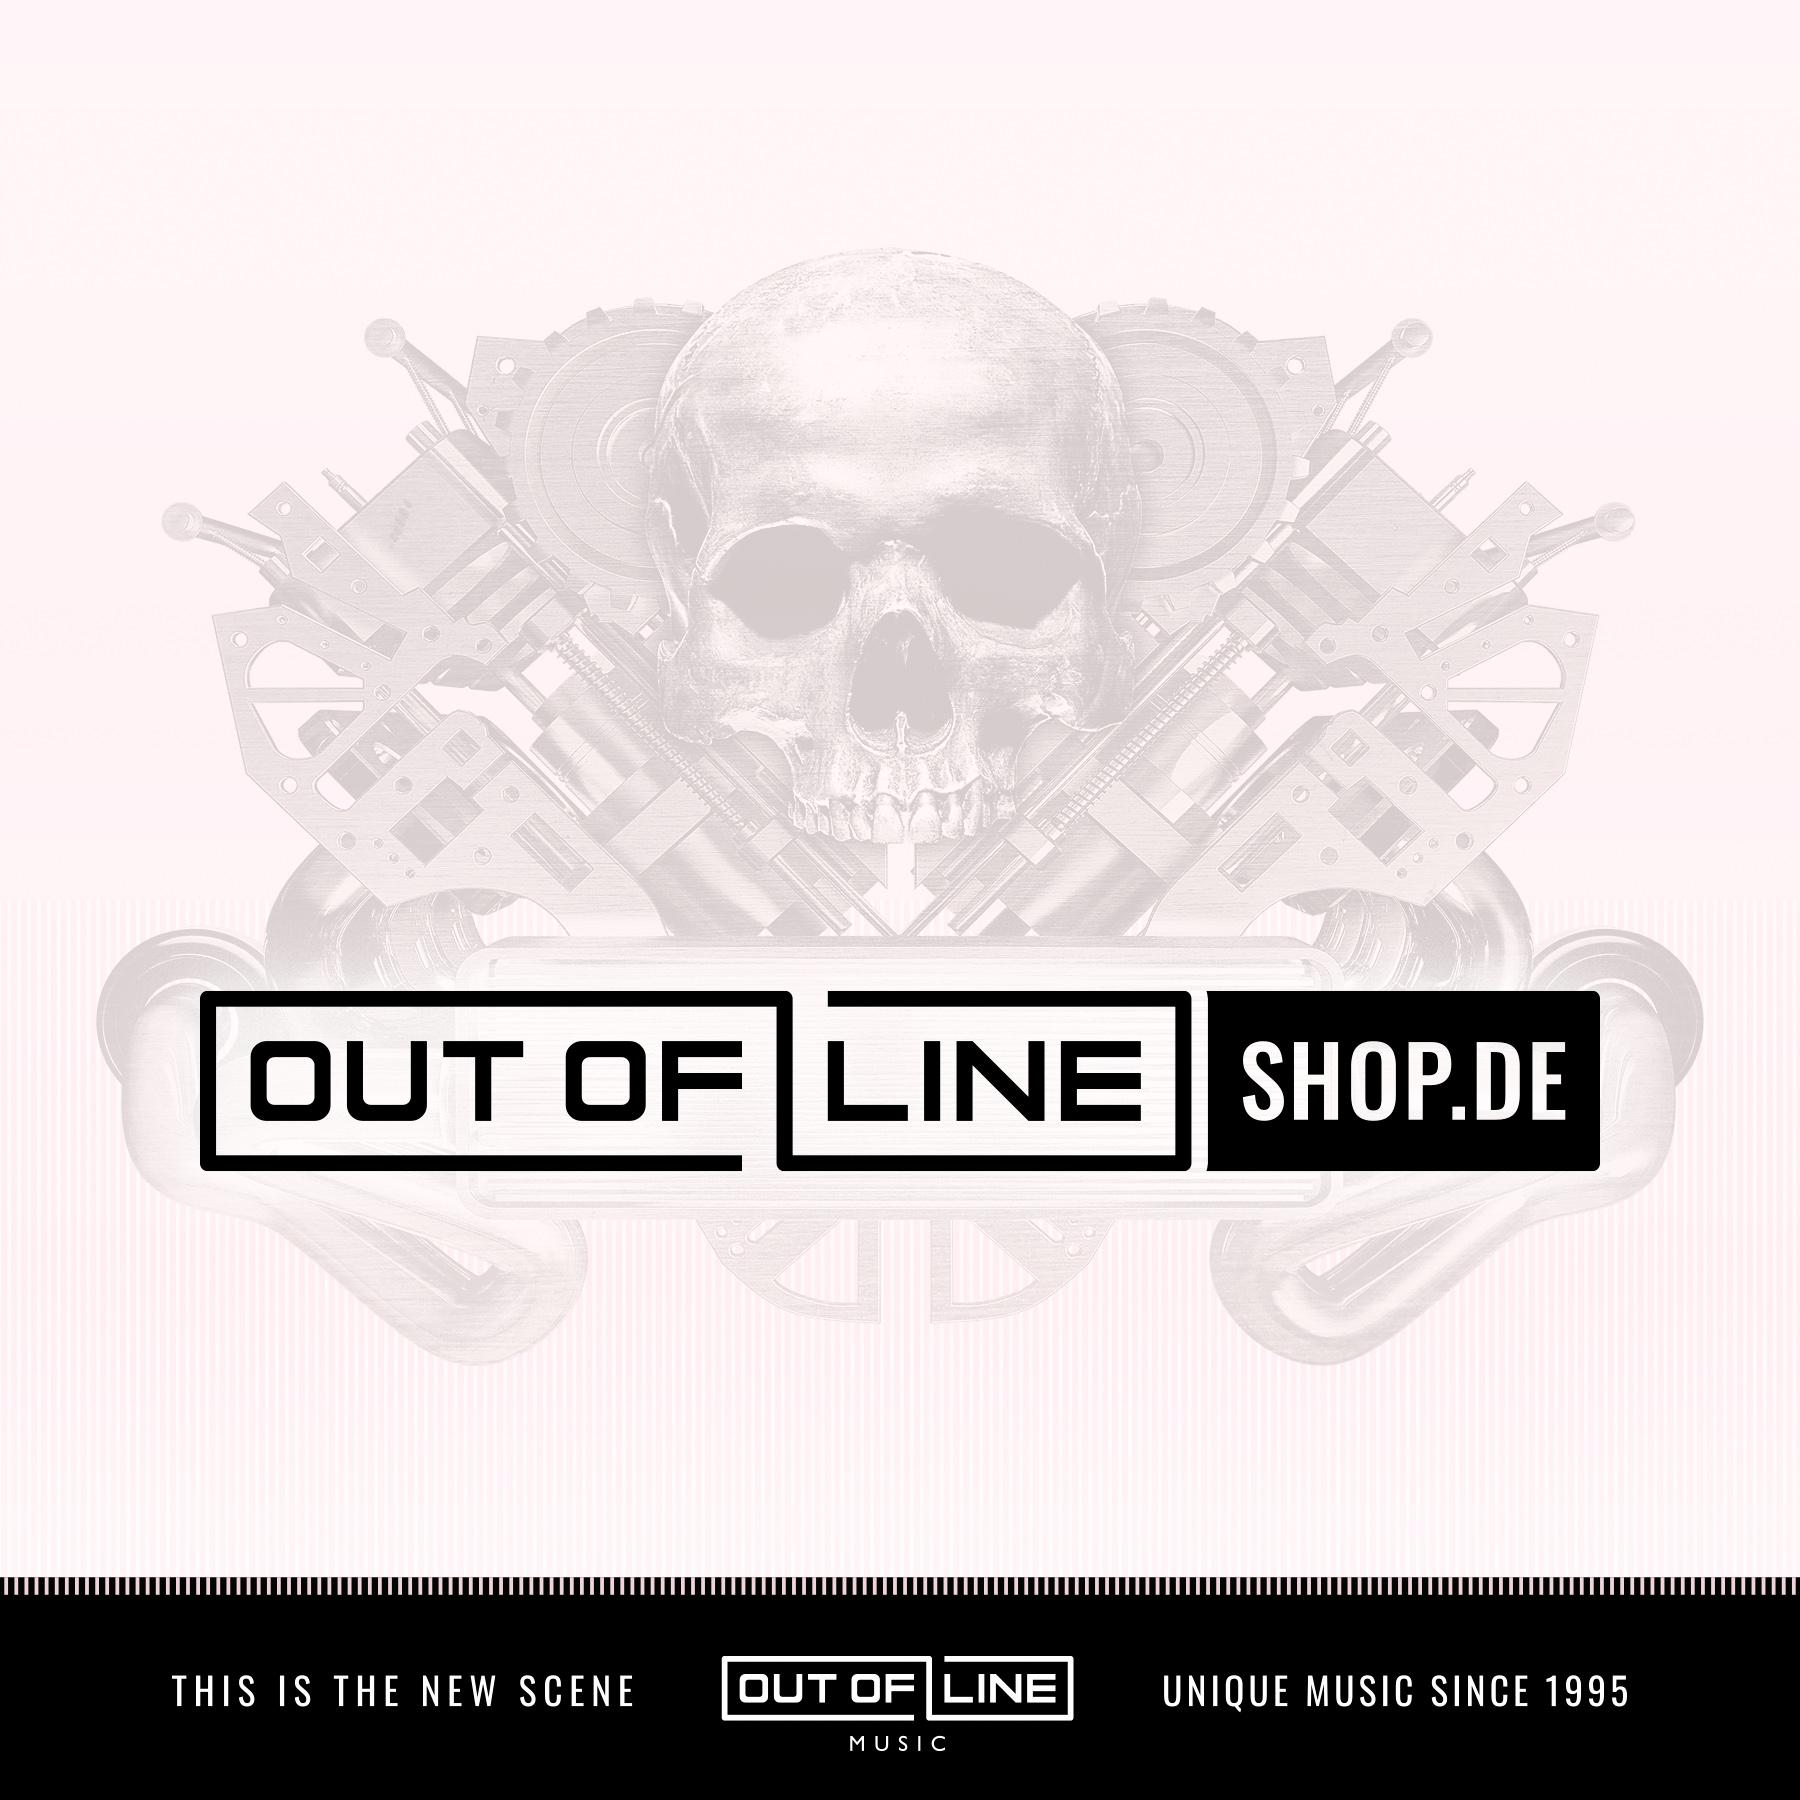 Cephalgy - Gott Maschine Vaterland - T-Shirt